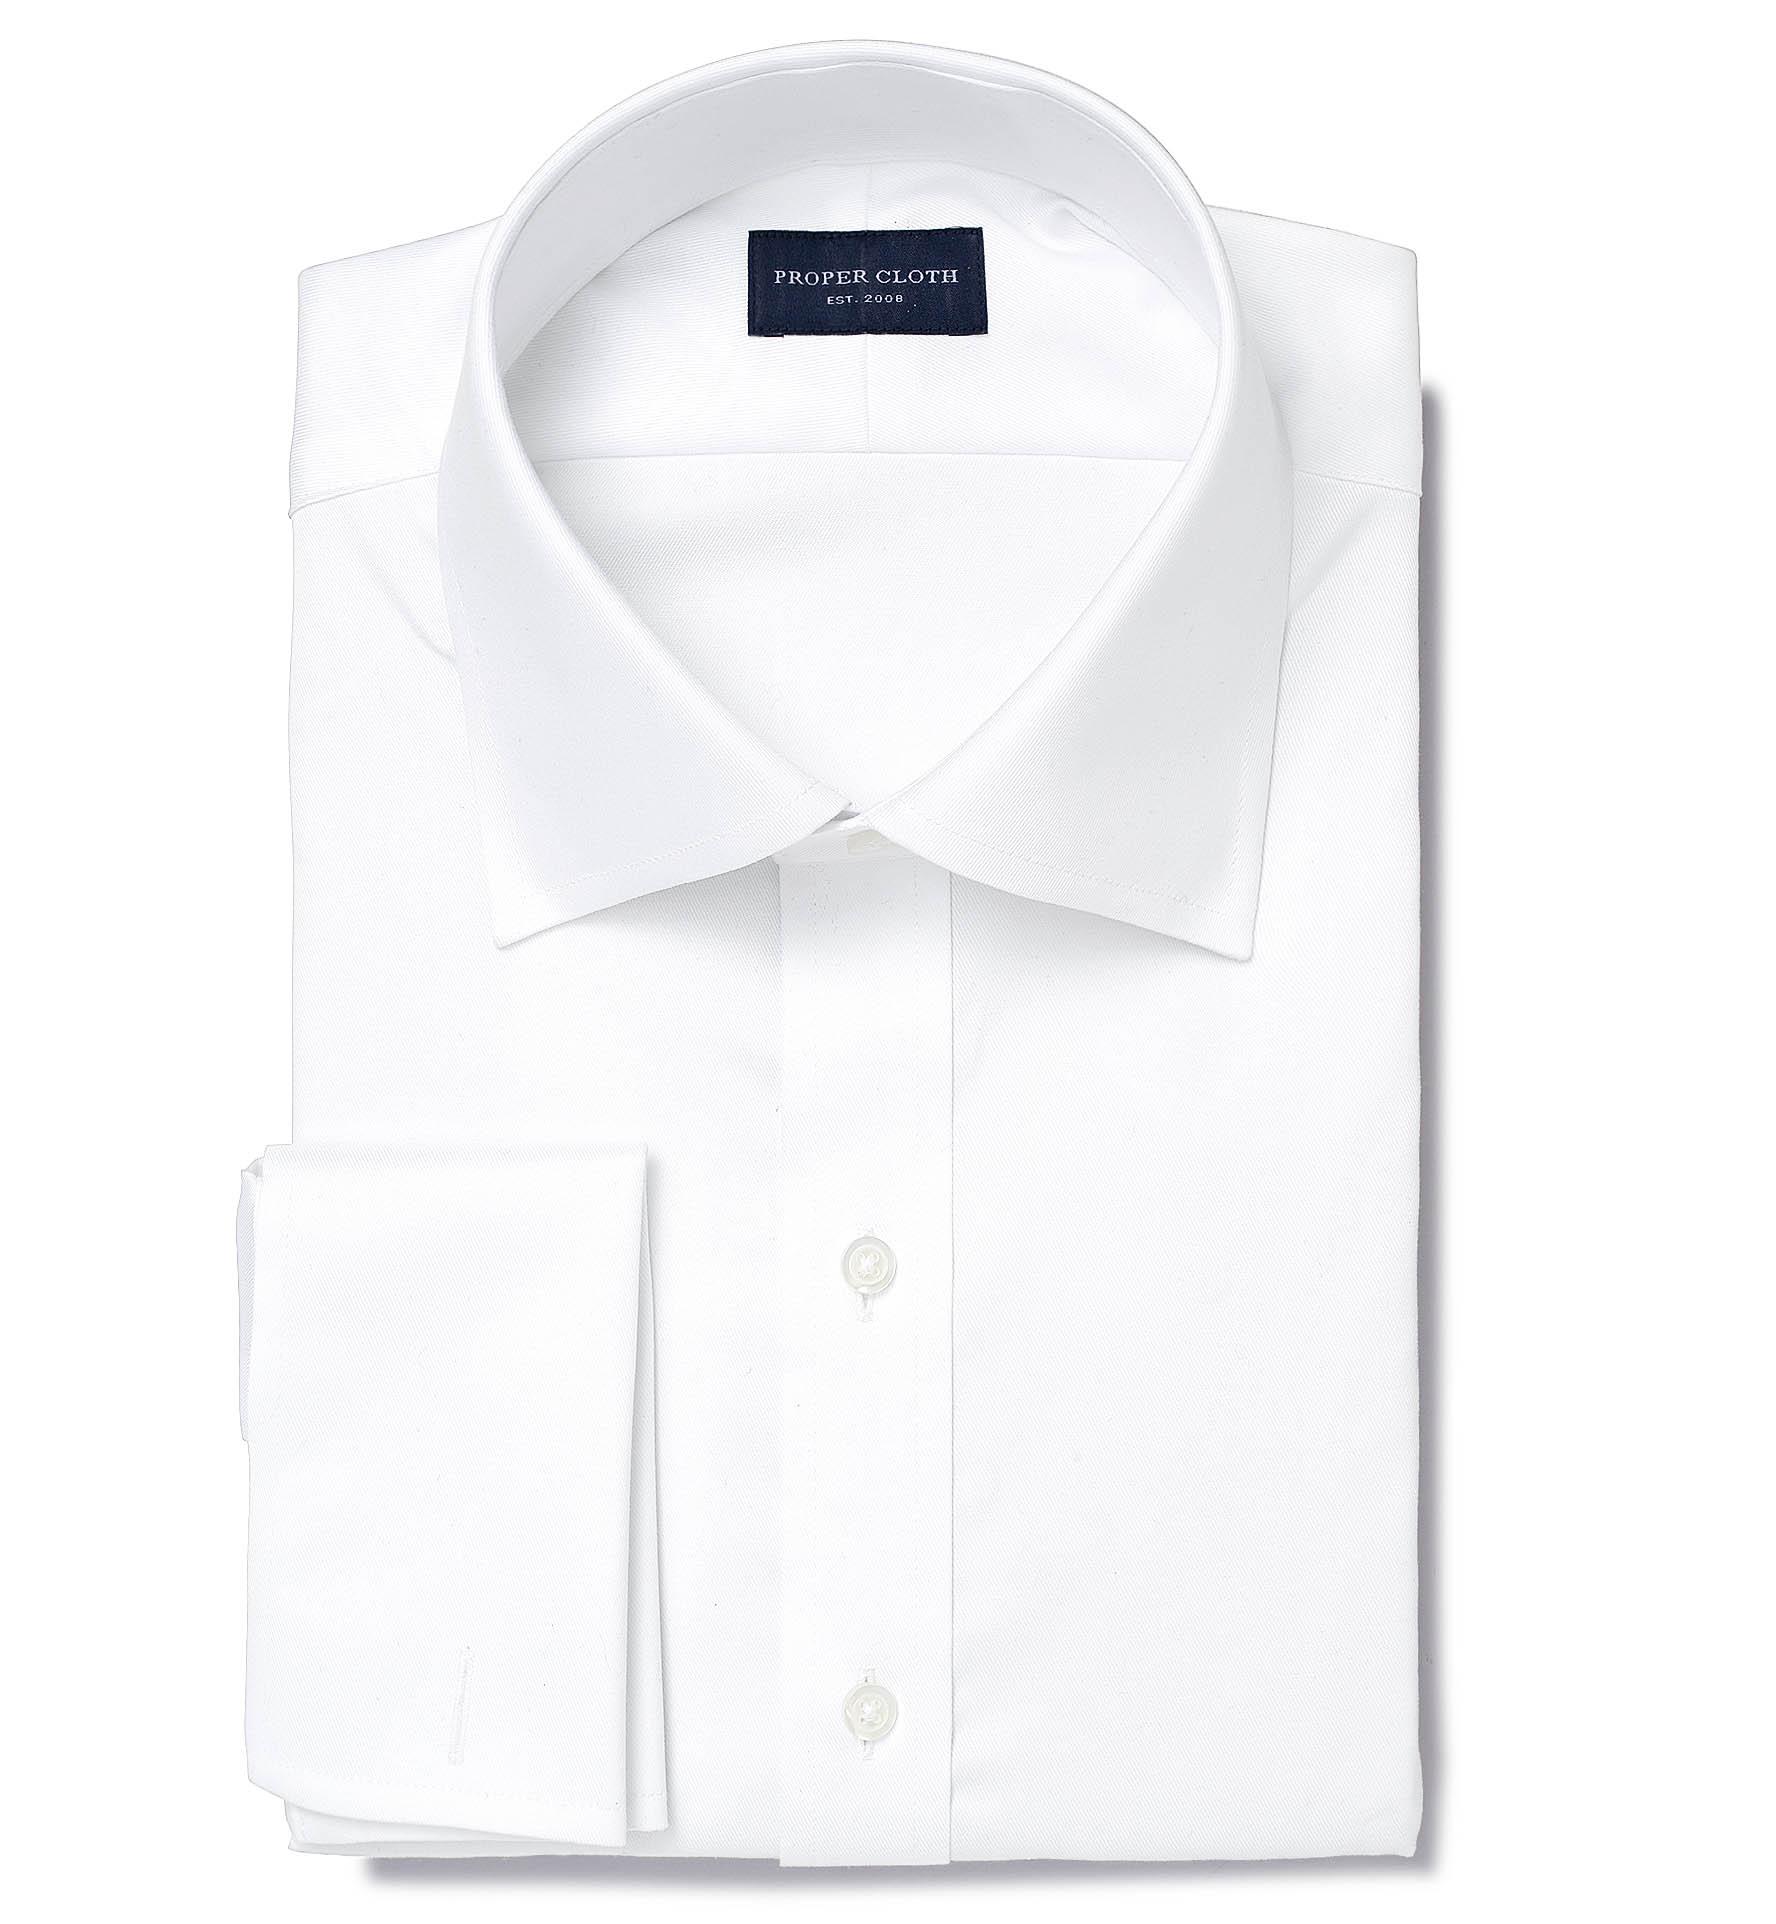 Lafayette White Twill Mens Dress Shirt By Proper Cloth